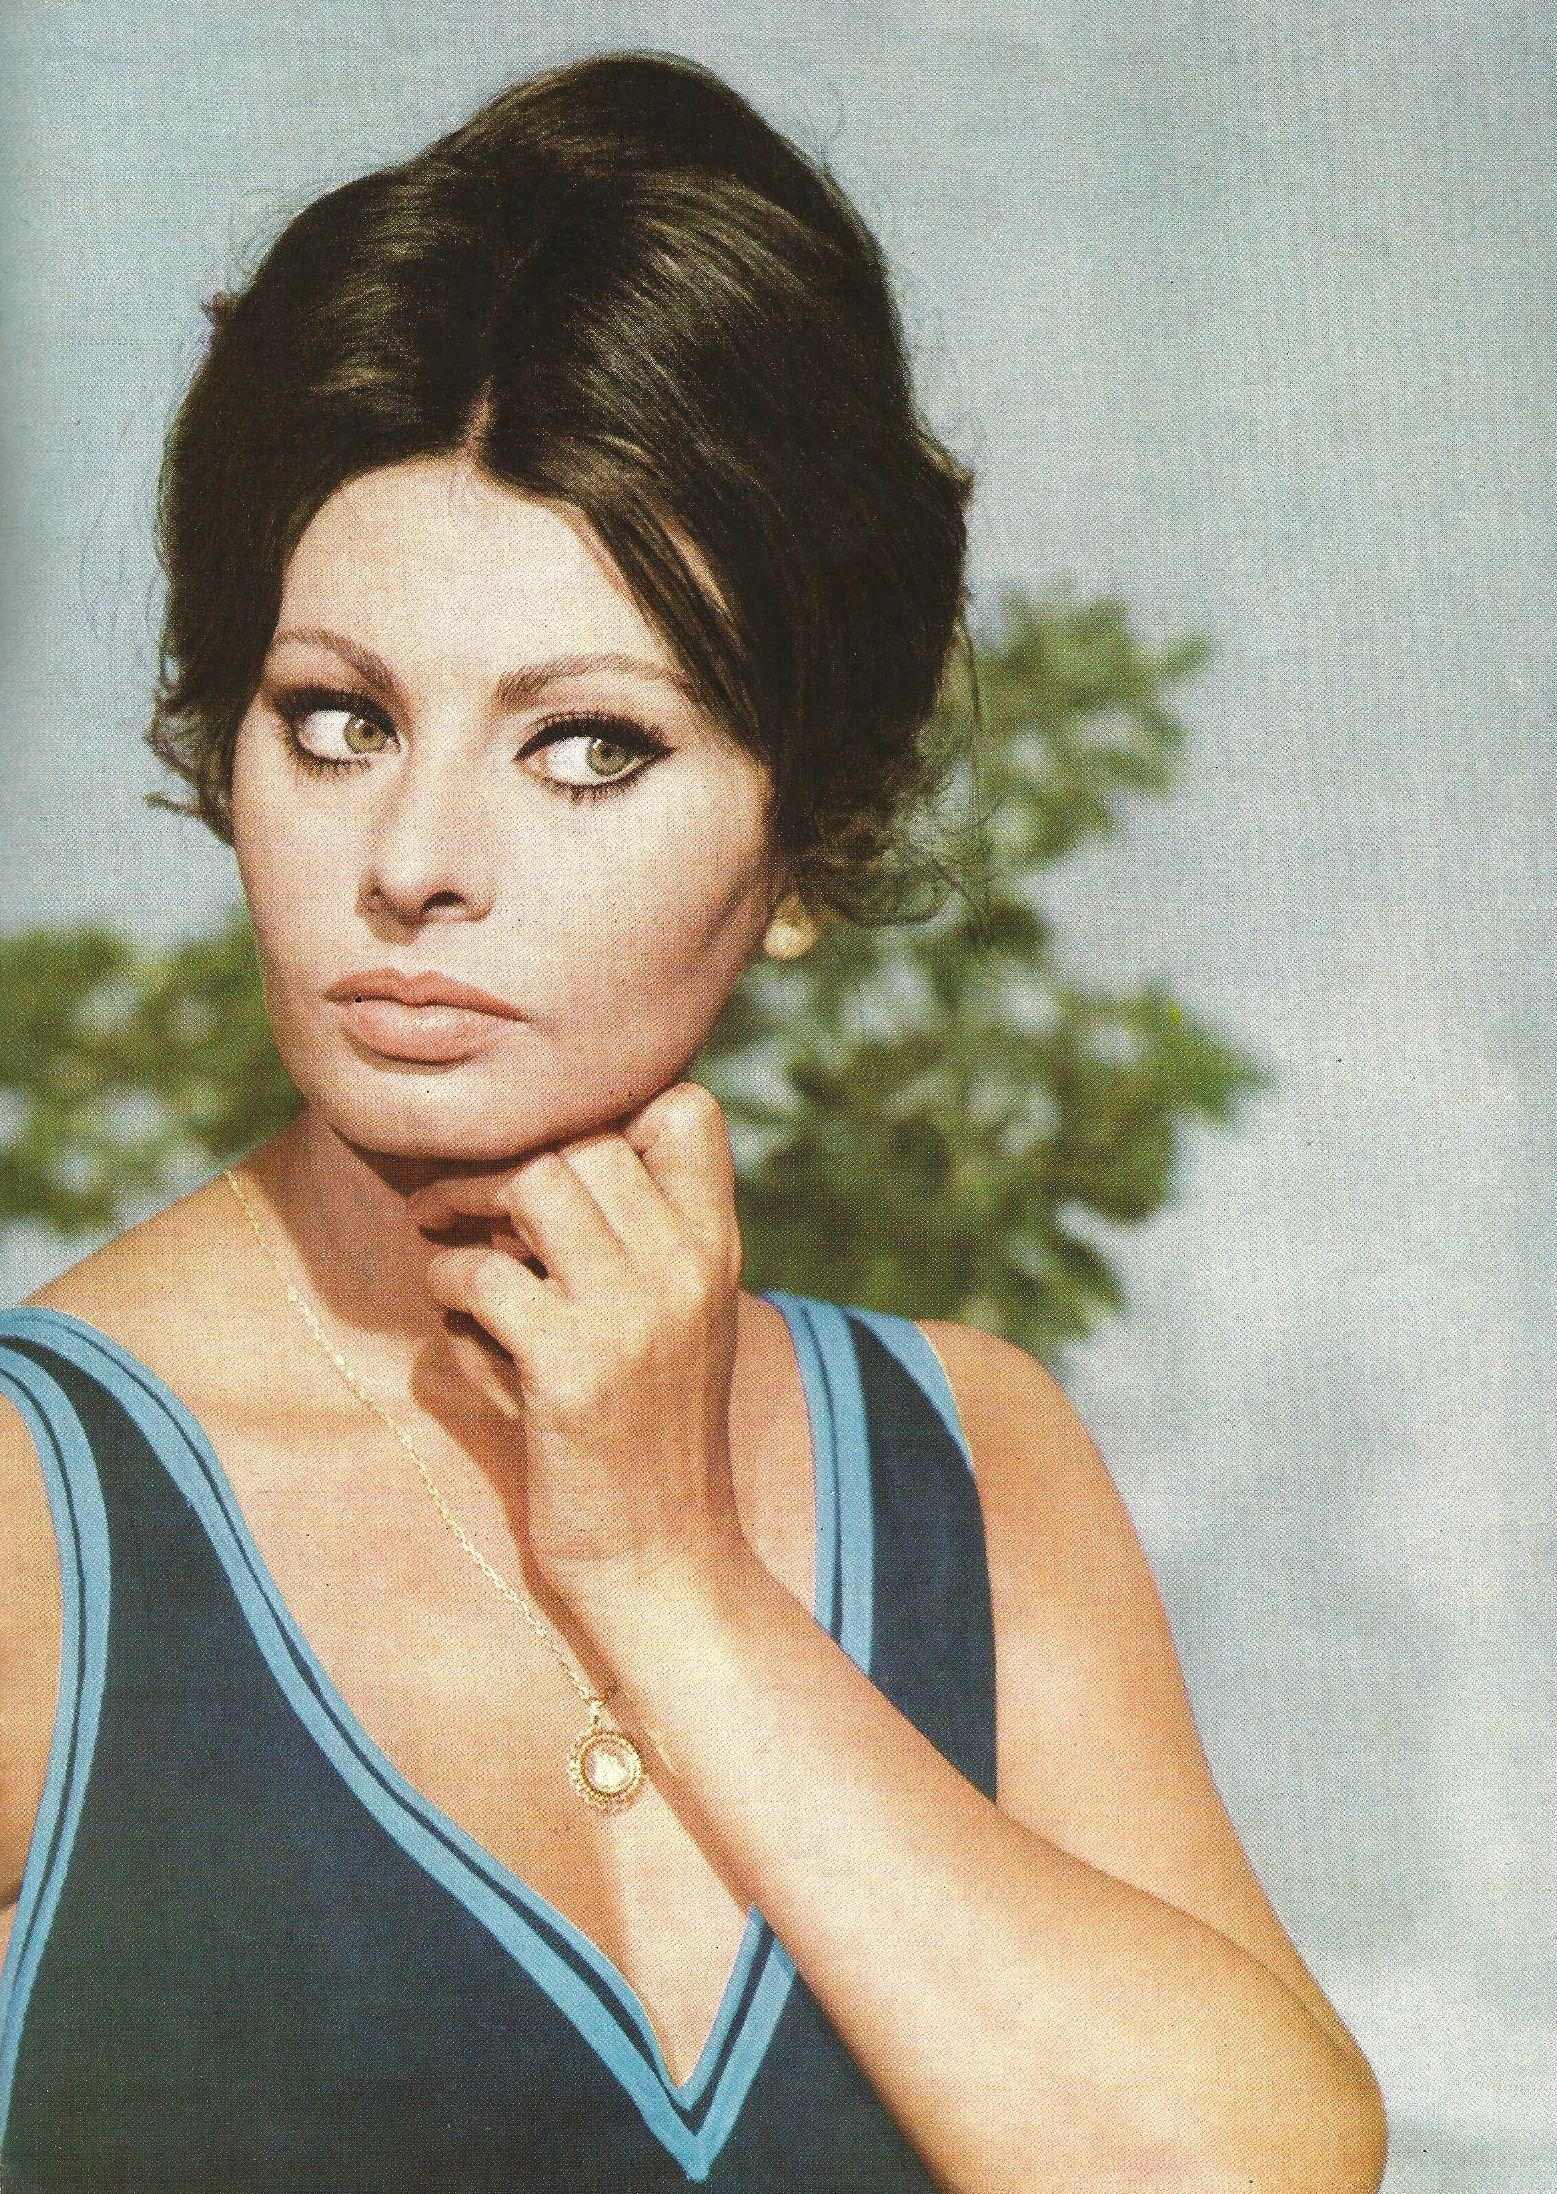 Sophia Loren Sophia L Sophia Loren Style Sophia Loren Sophia Loren Images